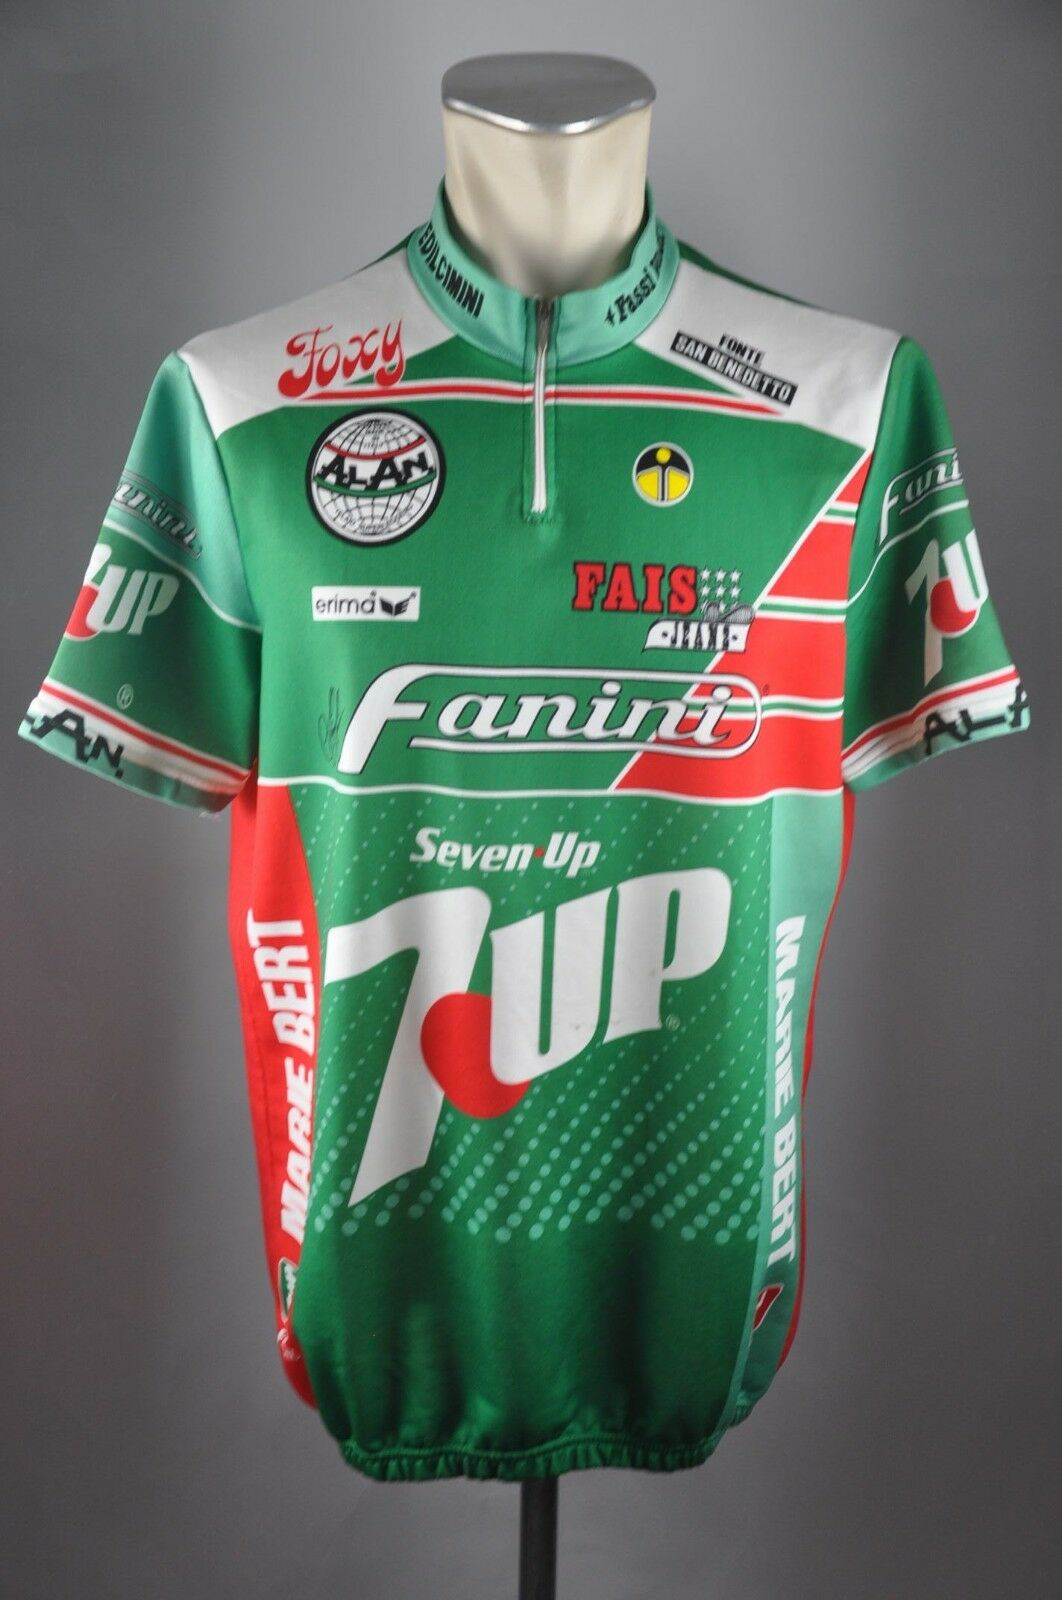 Erima Fanini 7UP Bike Rad Trikot Gr. 7 XL 58cm jersey Fahrrad cycling N1